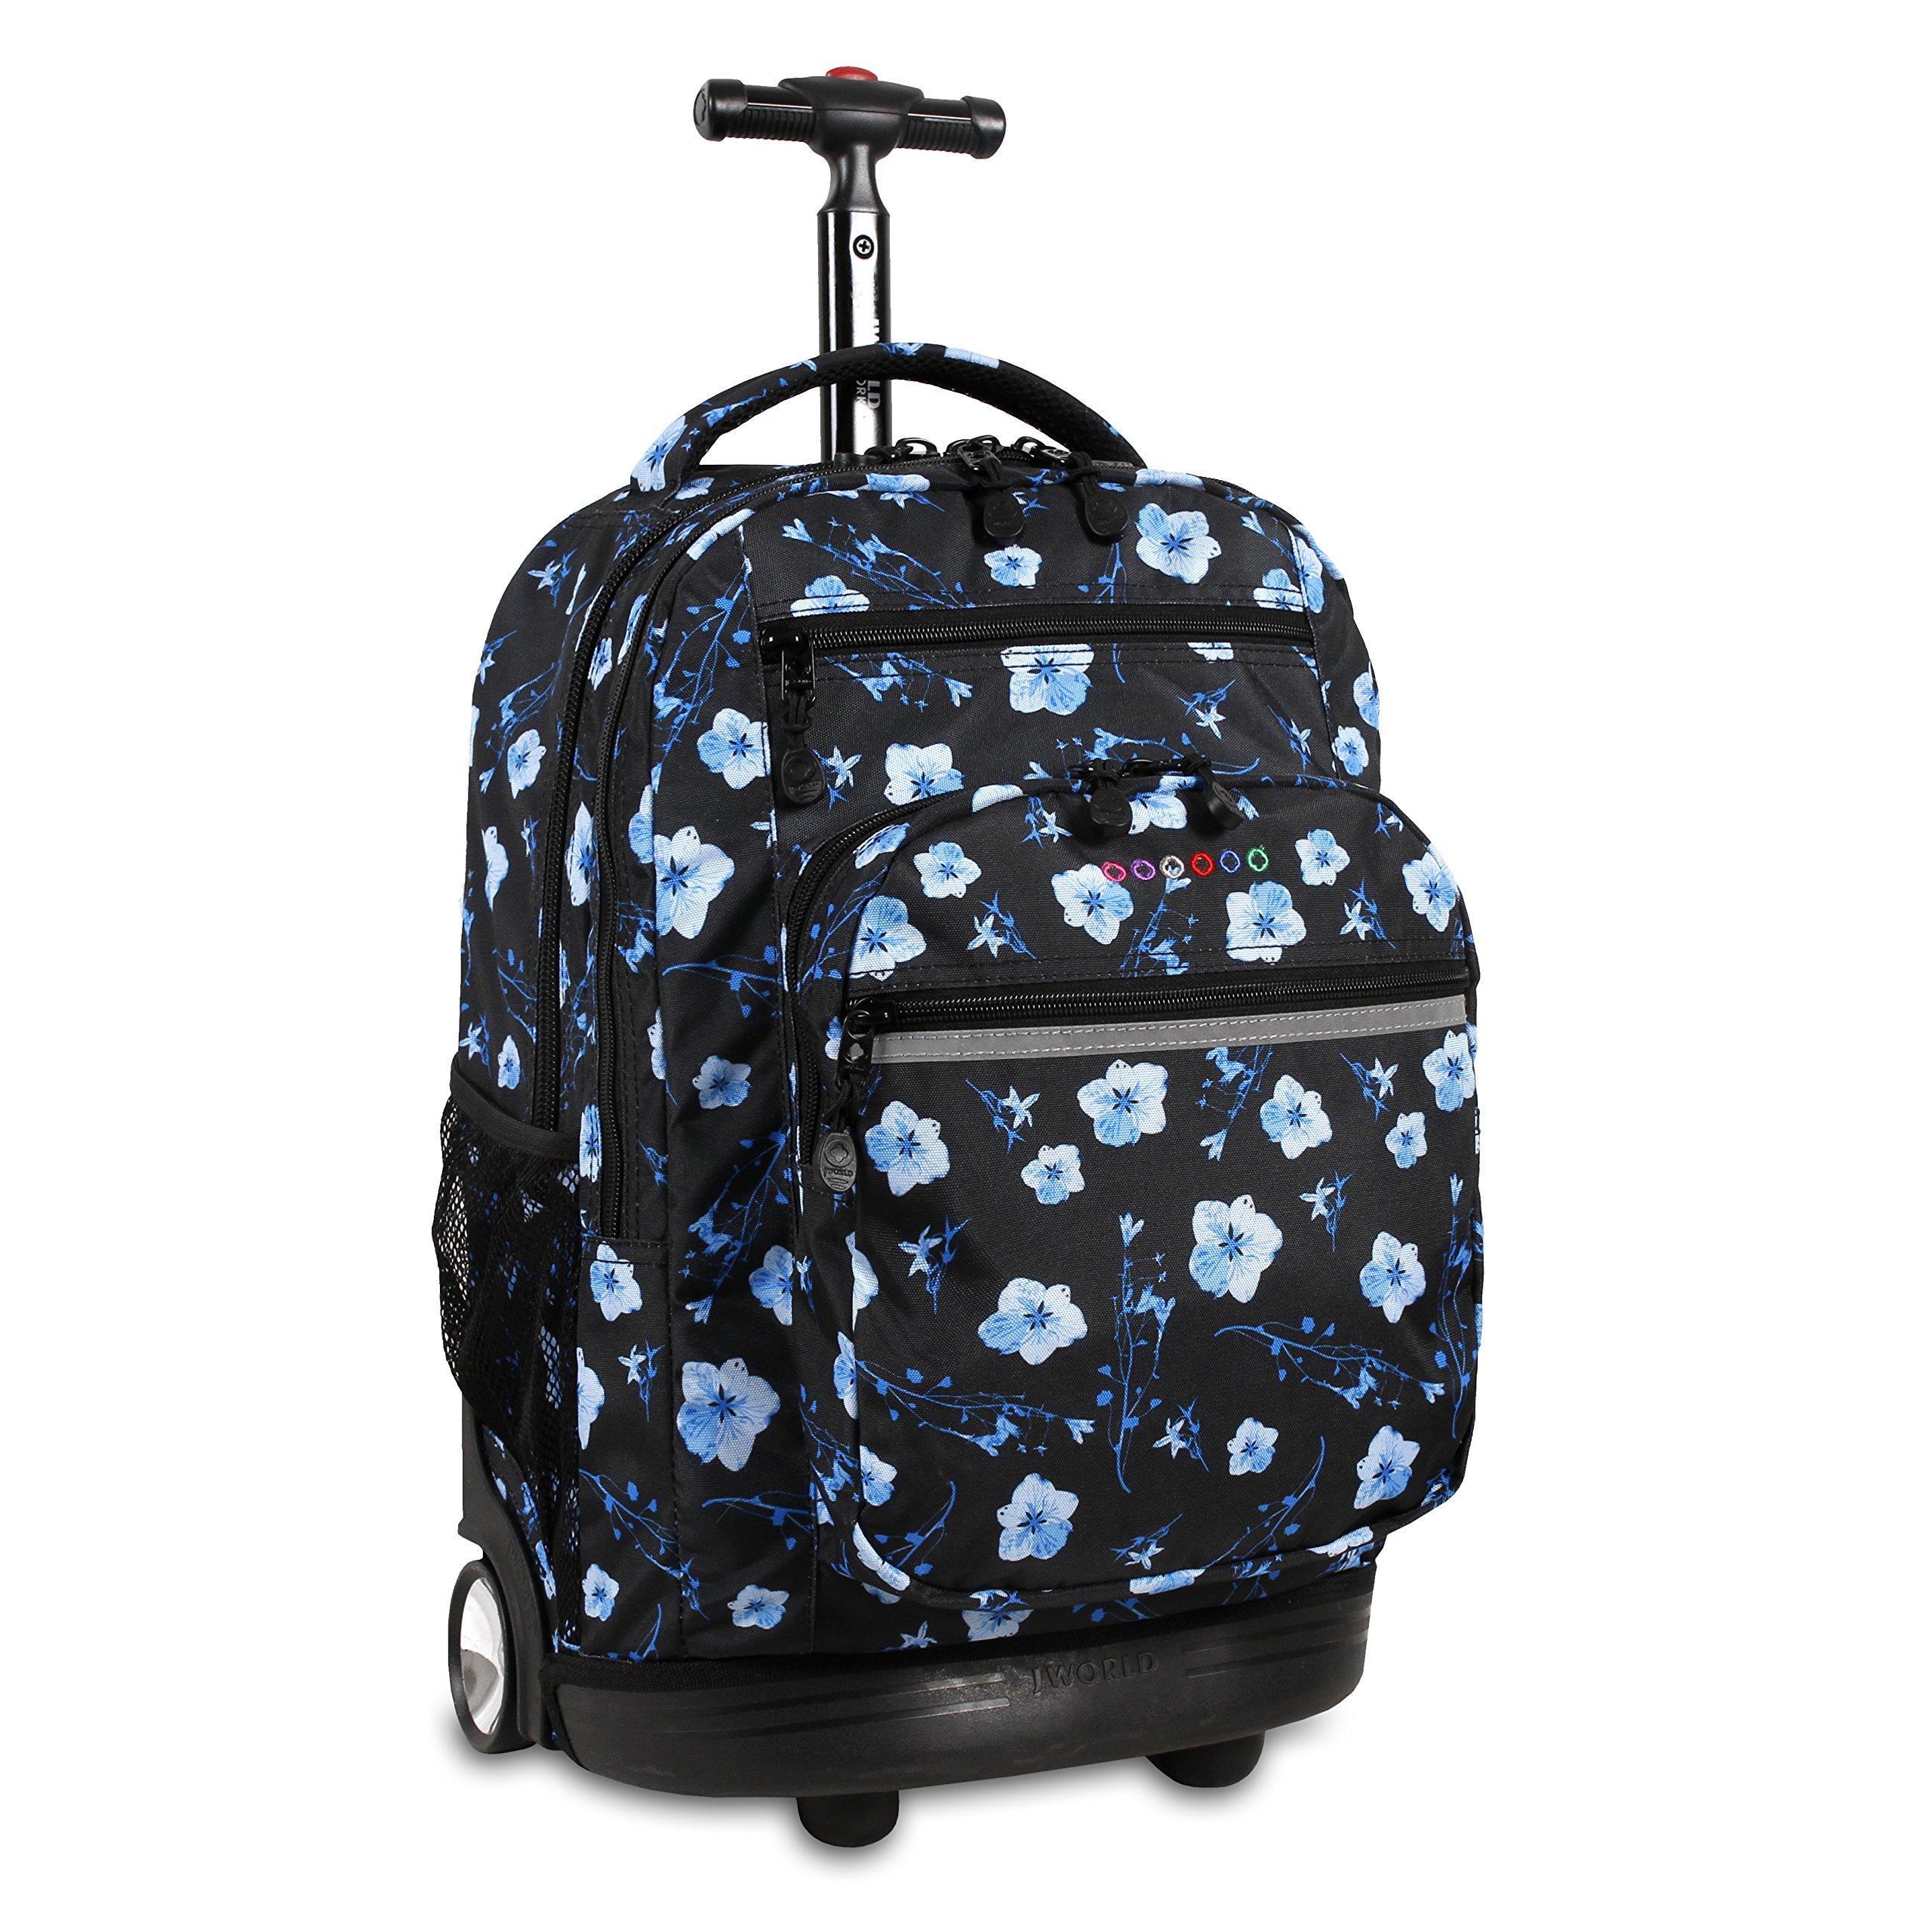 J World New York Sundance Rolling Backpack, Night Bloom, One Size